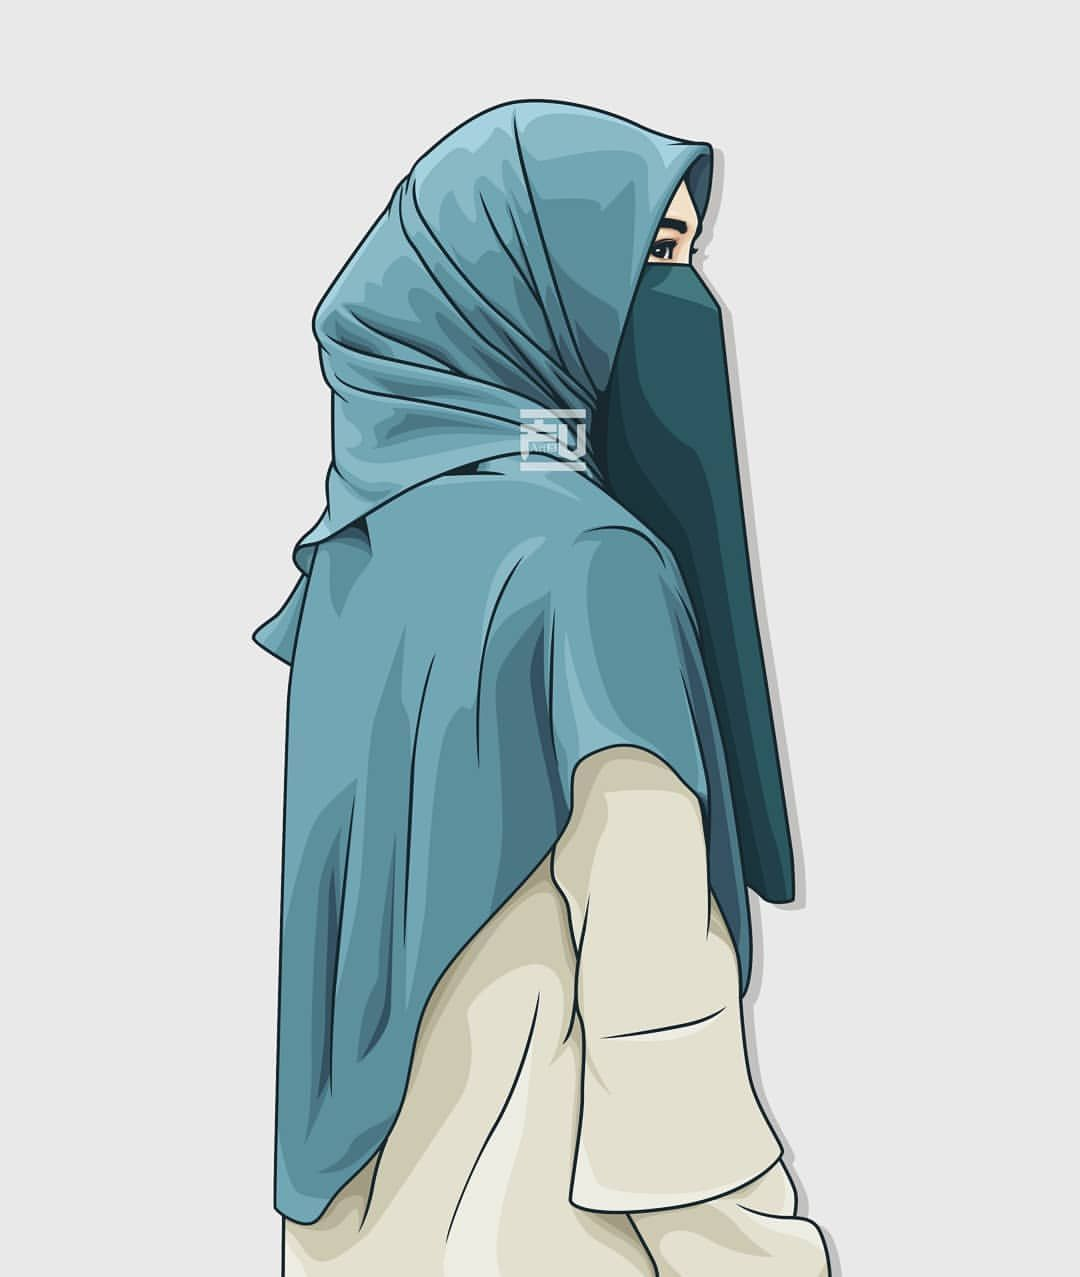 No need to register, buy now! Wallpaper Muslimah Hijab Cartoon Niqab Girl 1080x1277 Download Hd Wallpaper Wallpapertip